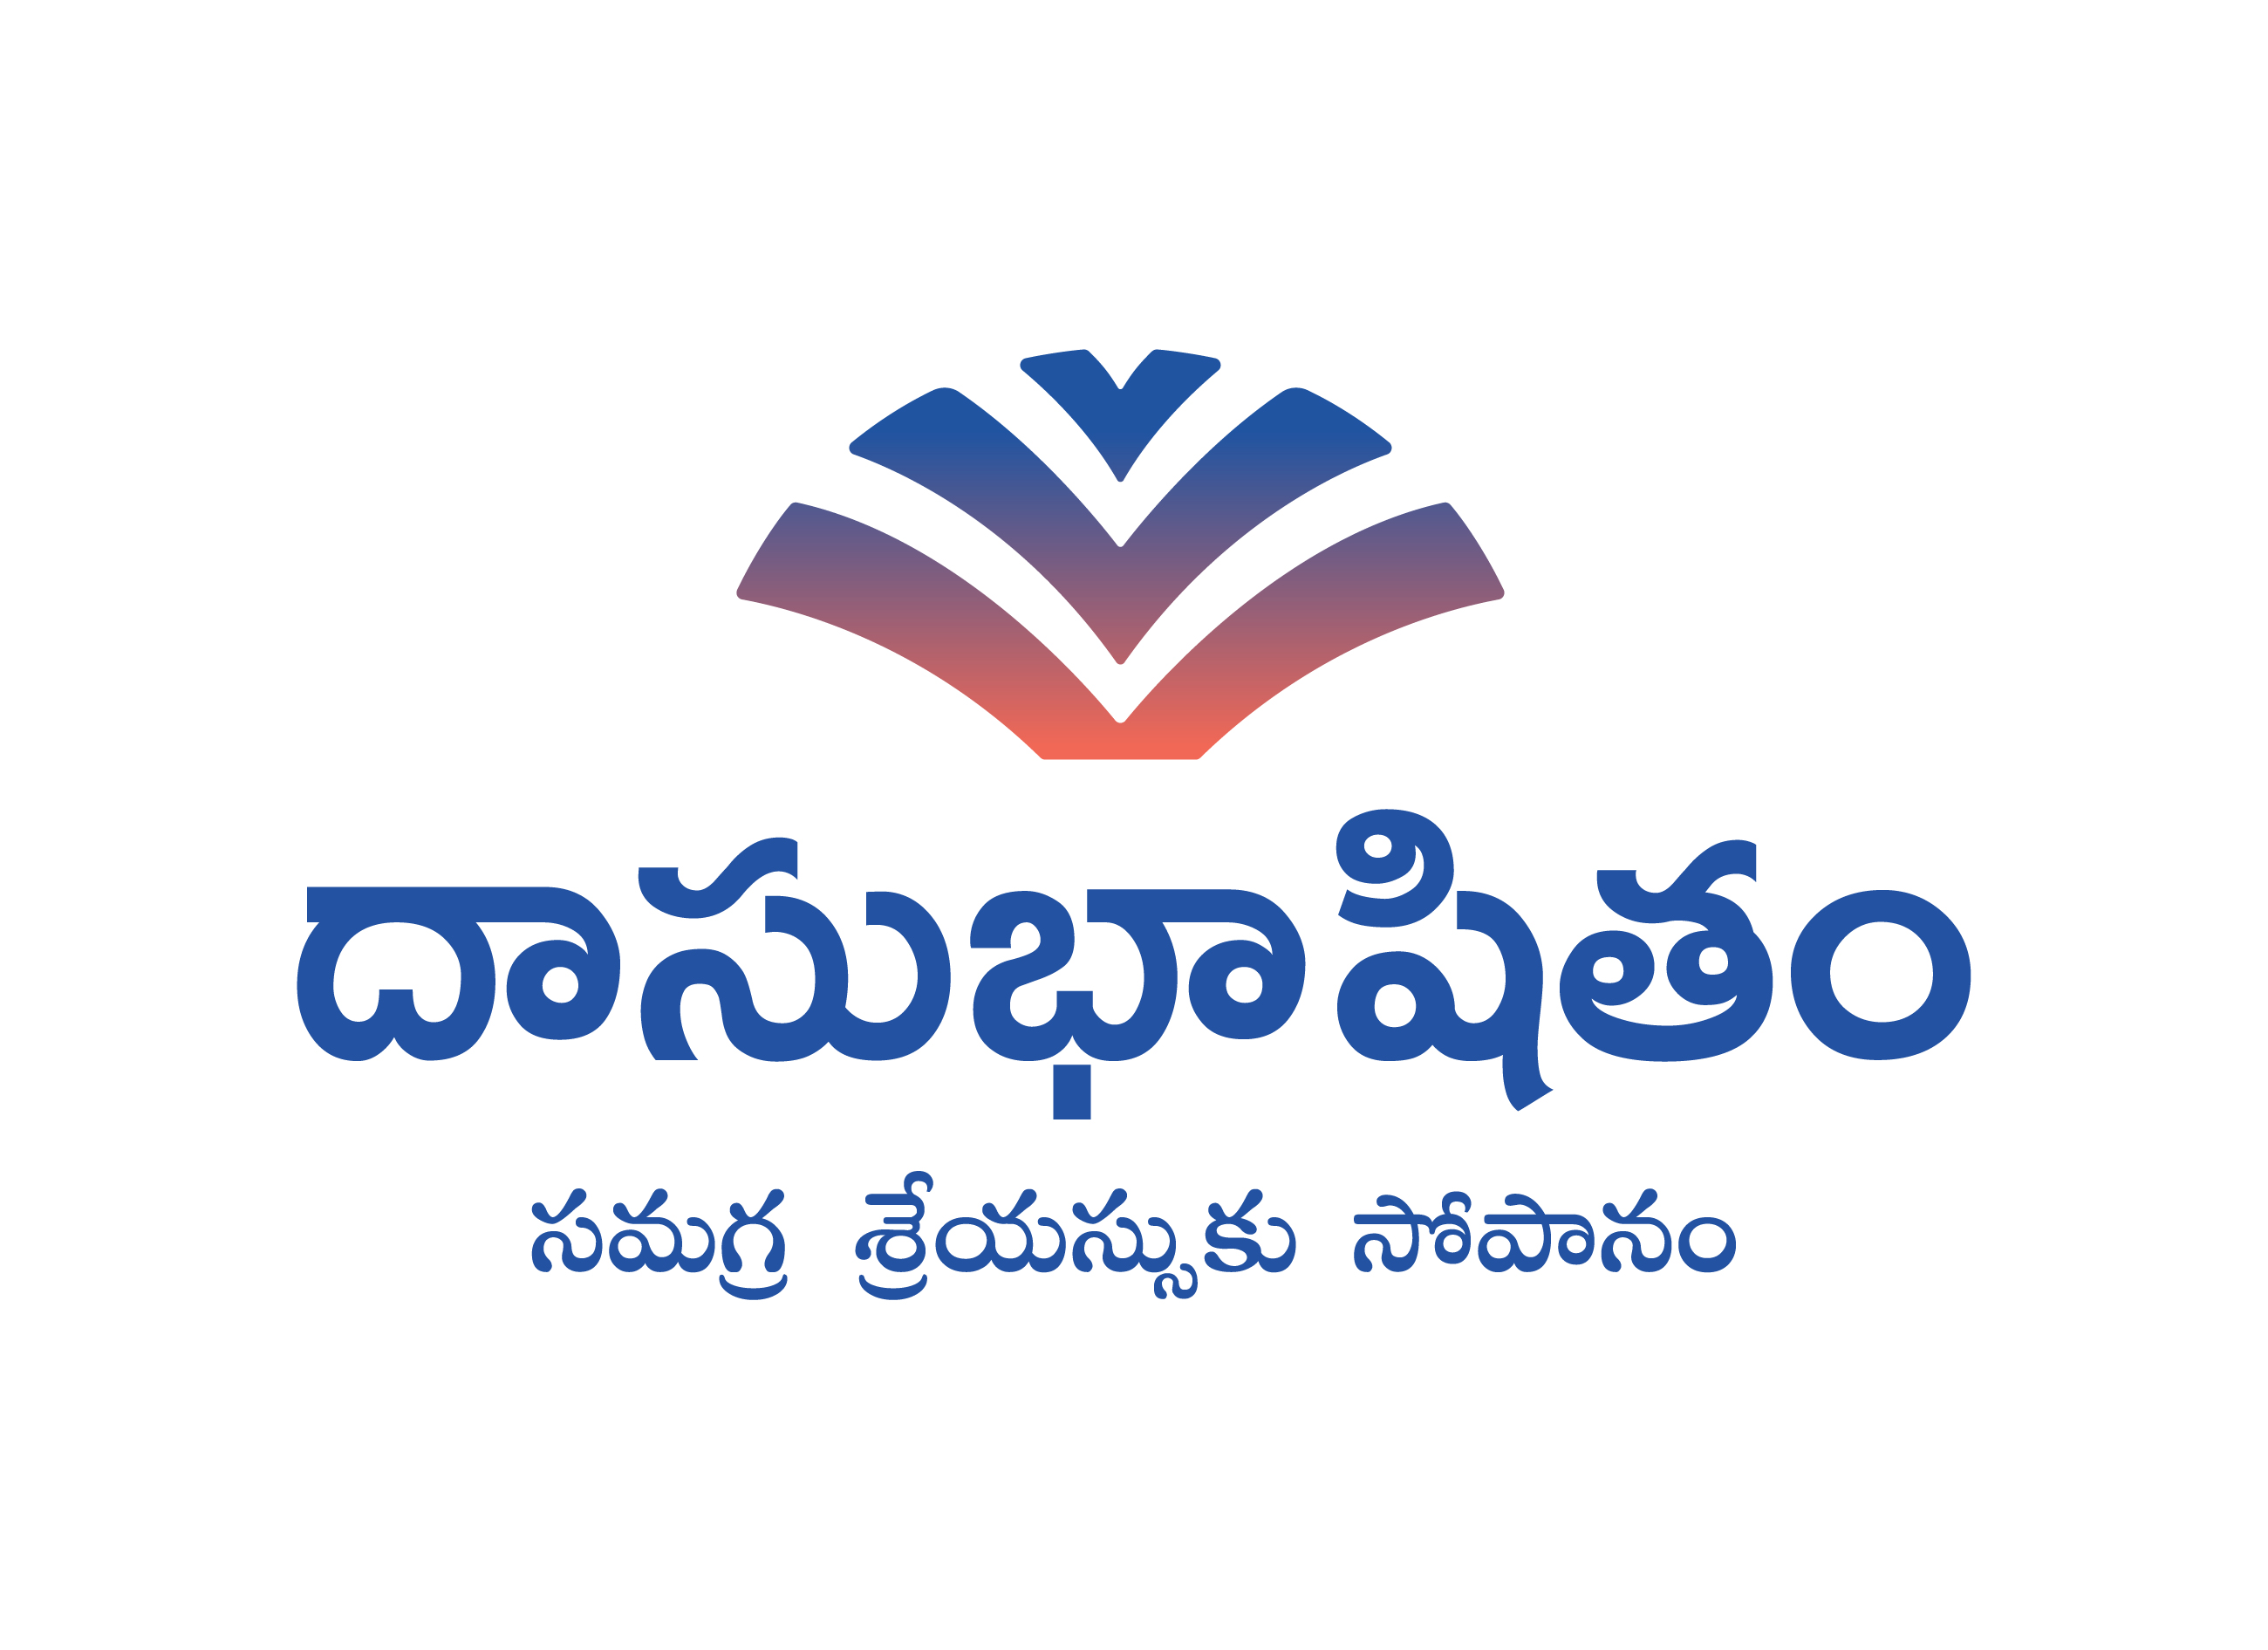 Dasubhashitam new logo